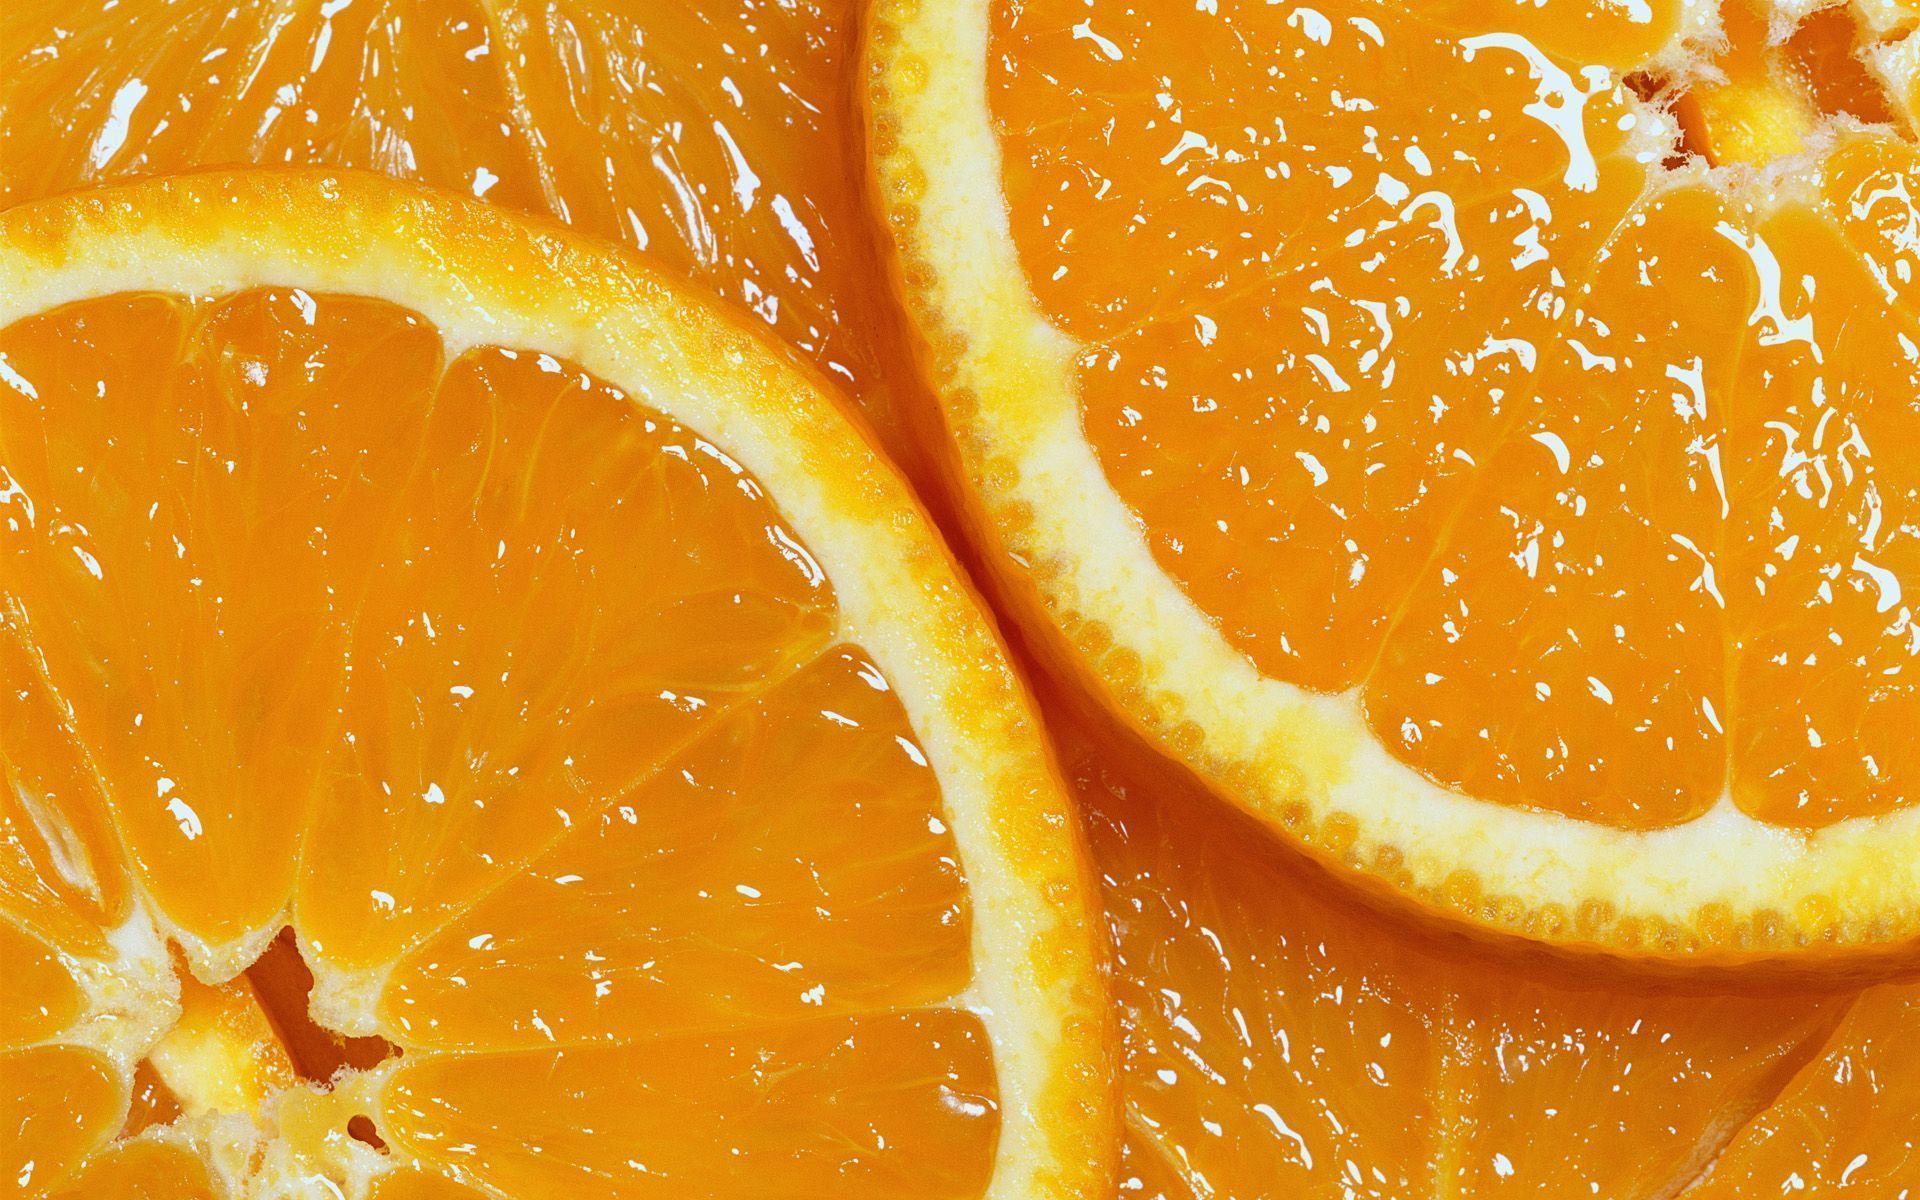 Fresh fruit wallpaper - Fresh Fruit Wallpapers Full Hd Wallpaper Search